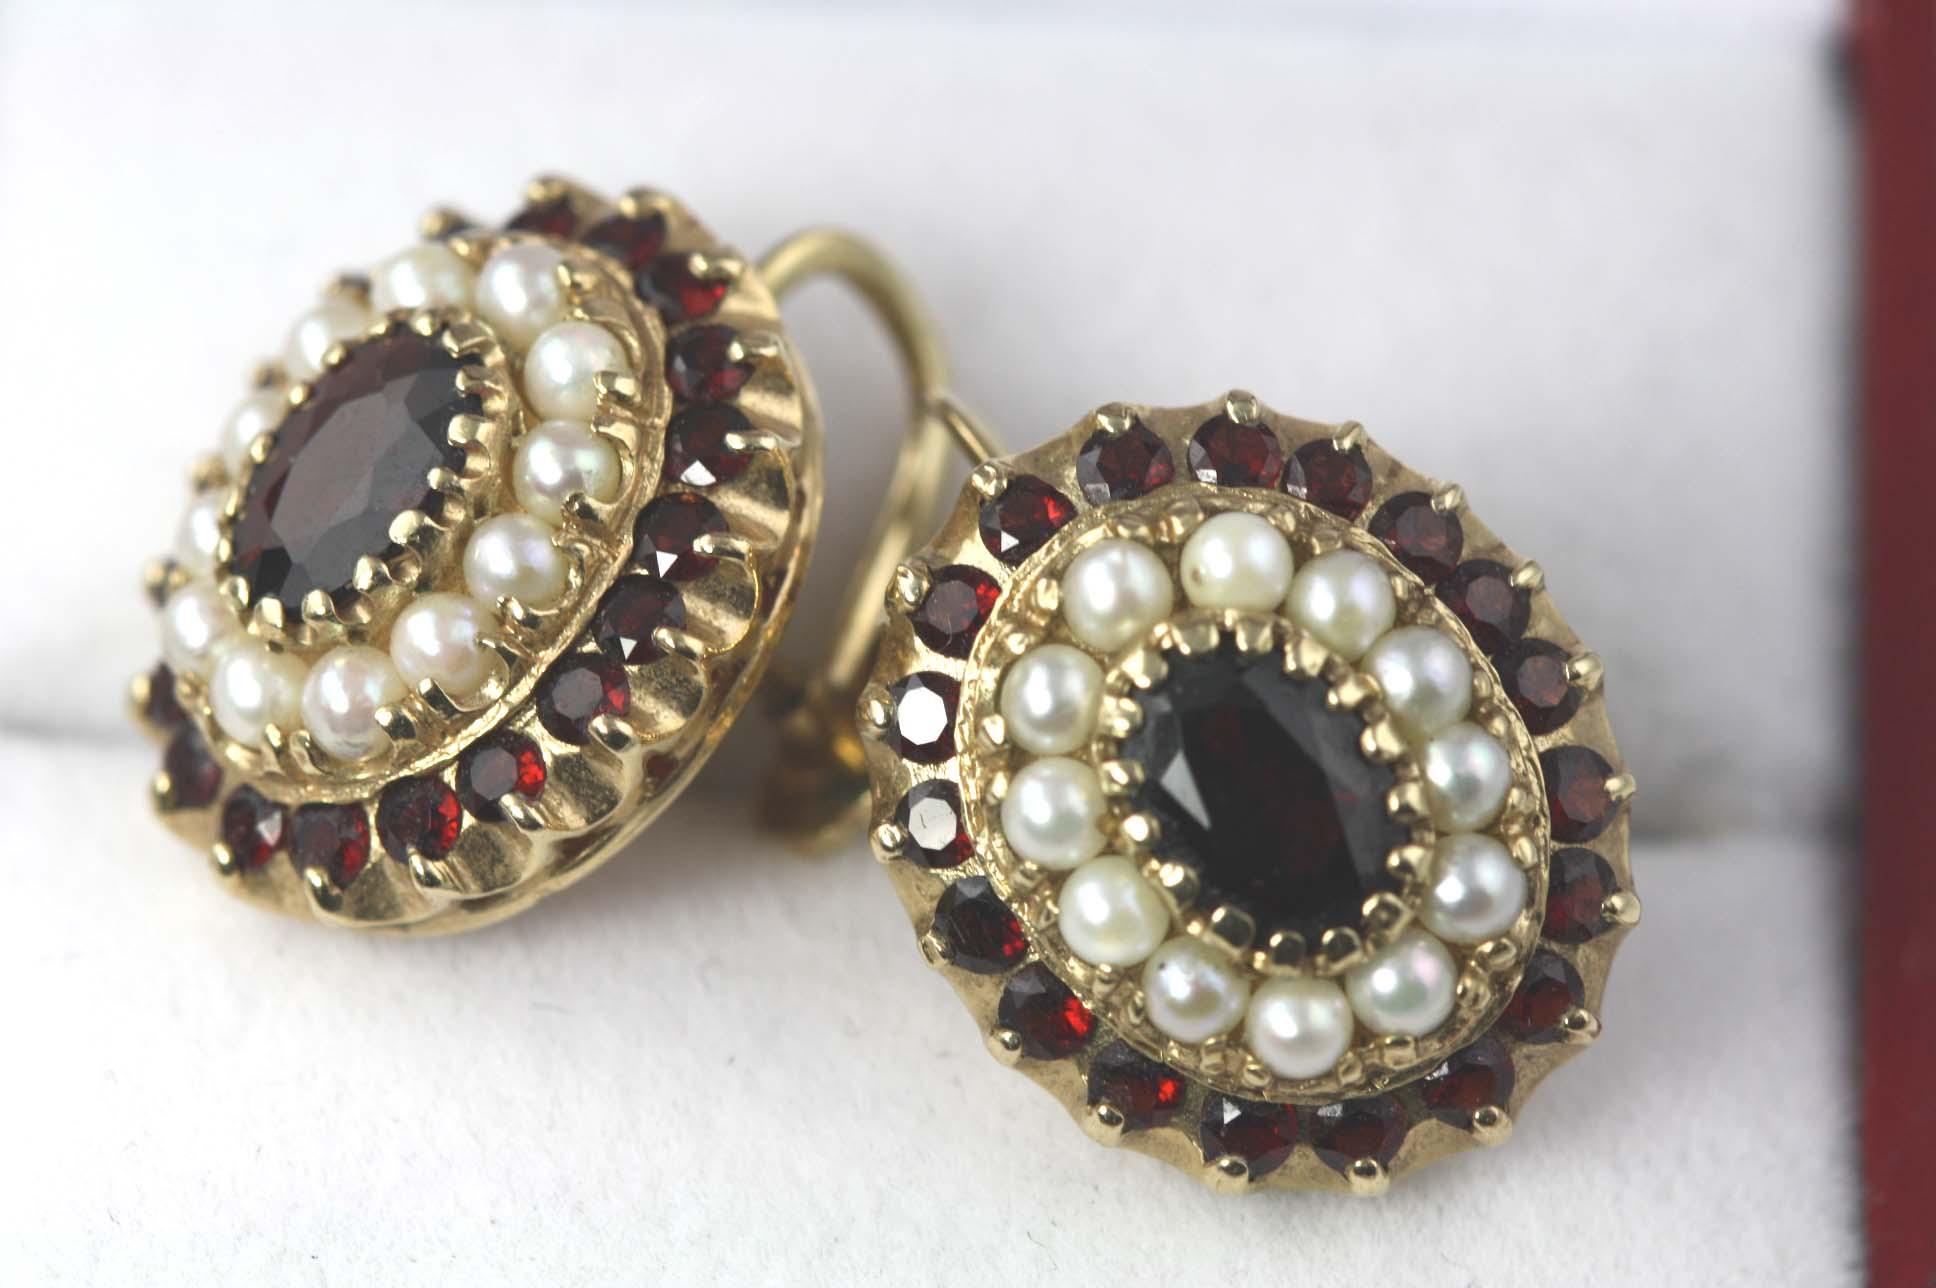 jeweler nanaimo consignment jewellery custom design